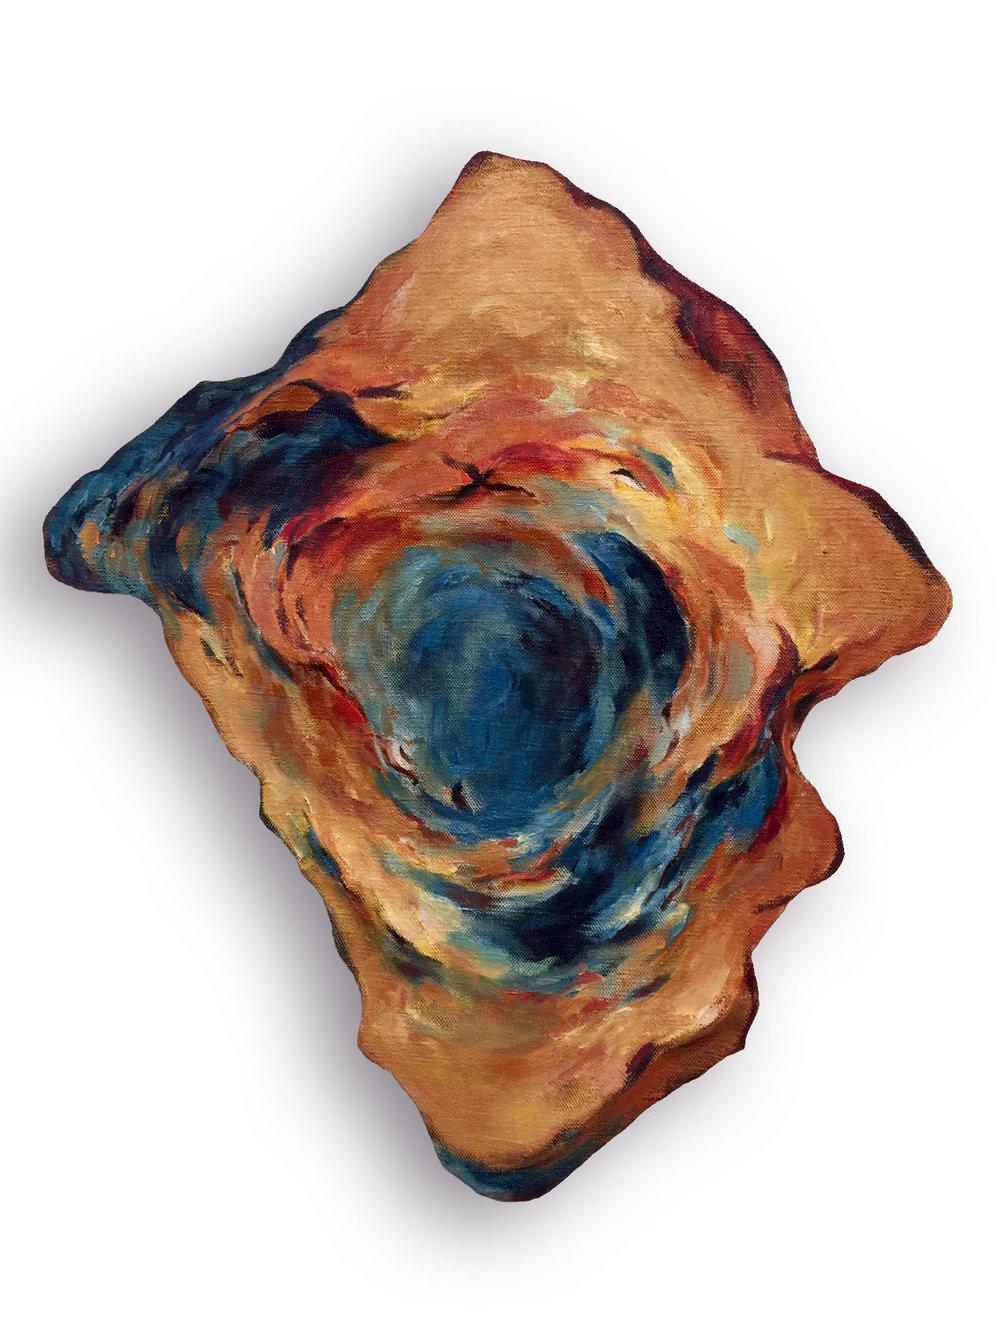 Untitled (Blue Center)